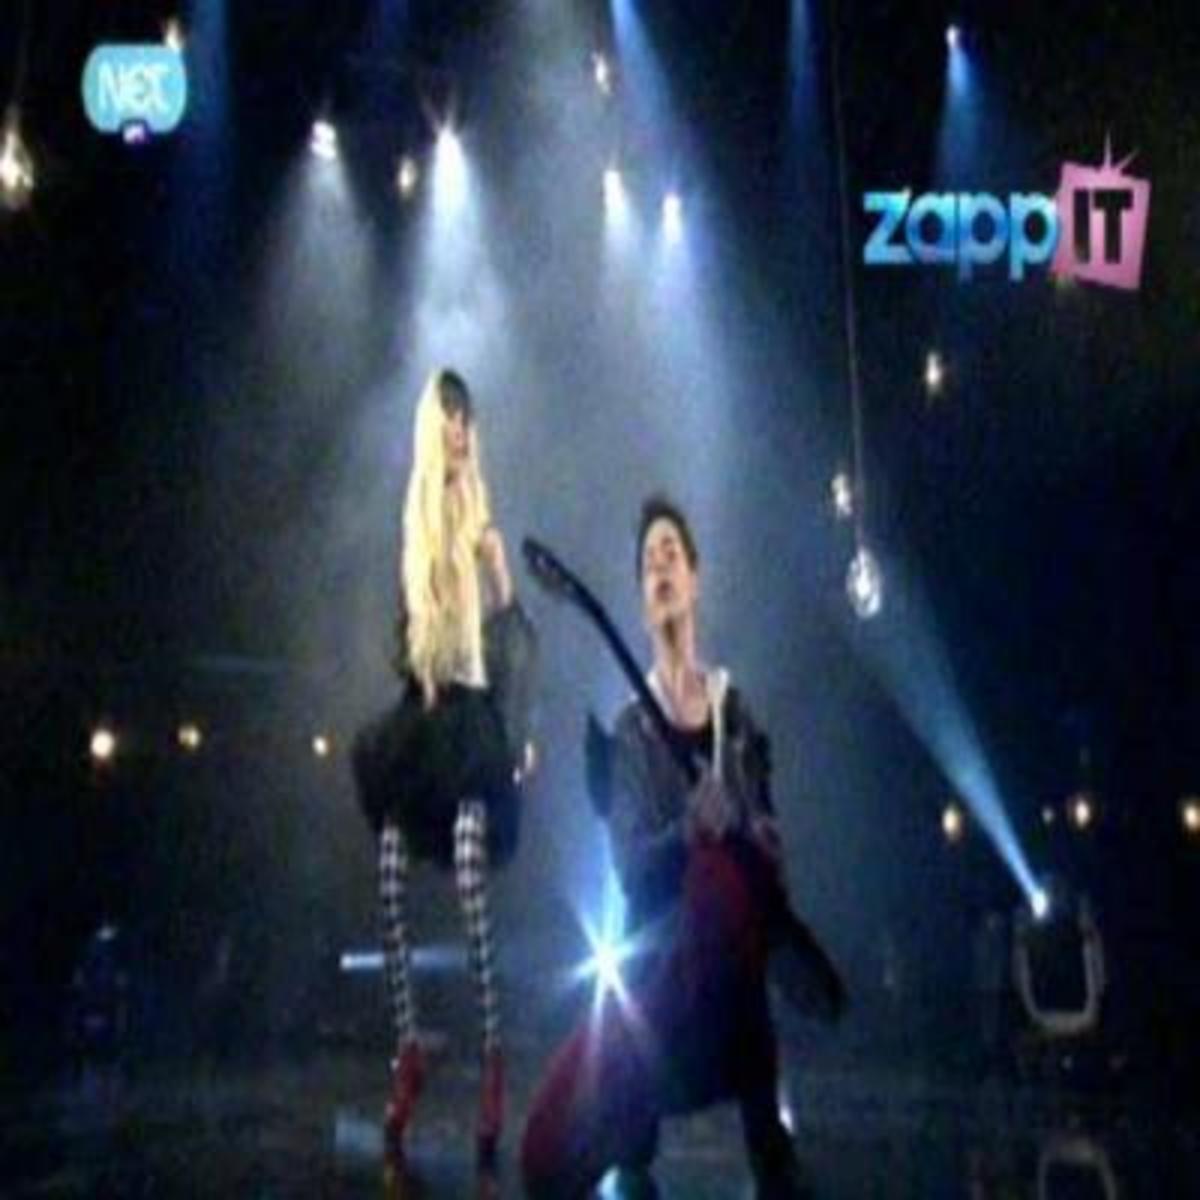 Eurovision 2012: Δείτε για πρώτη φορά το video clip του «No parking»! | Newsit.gr